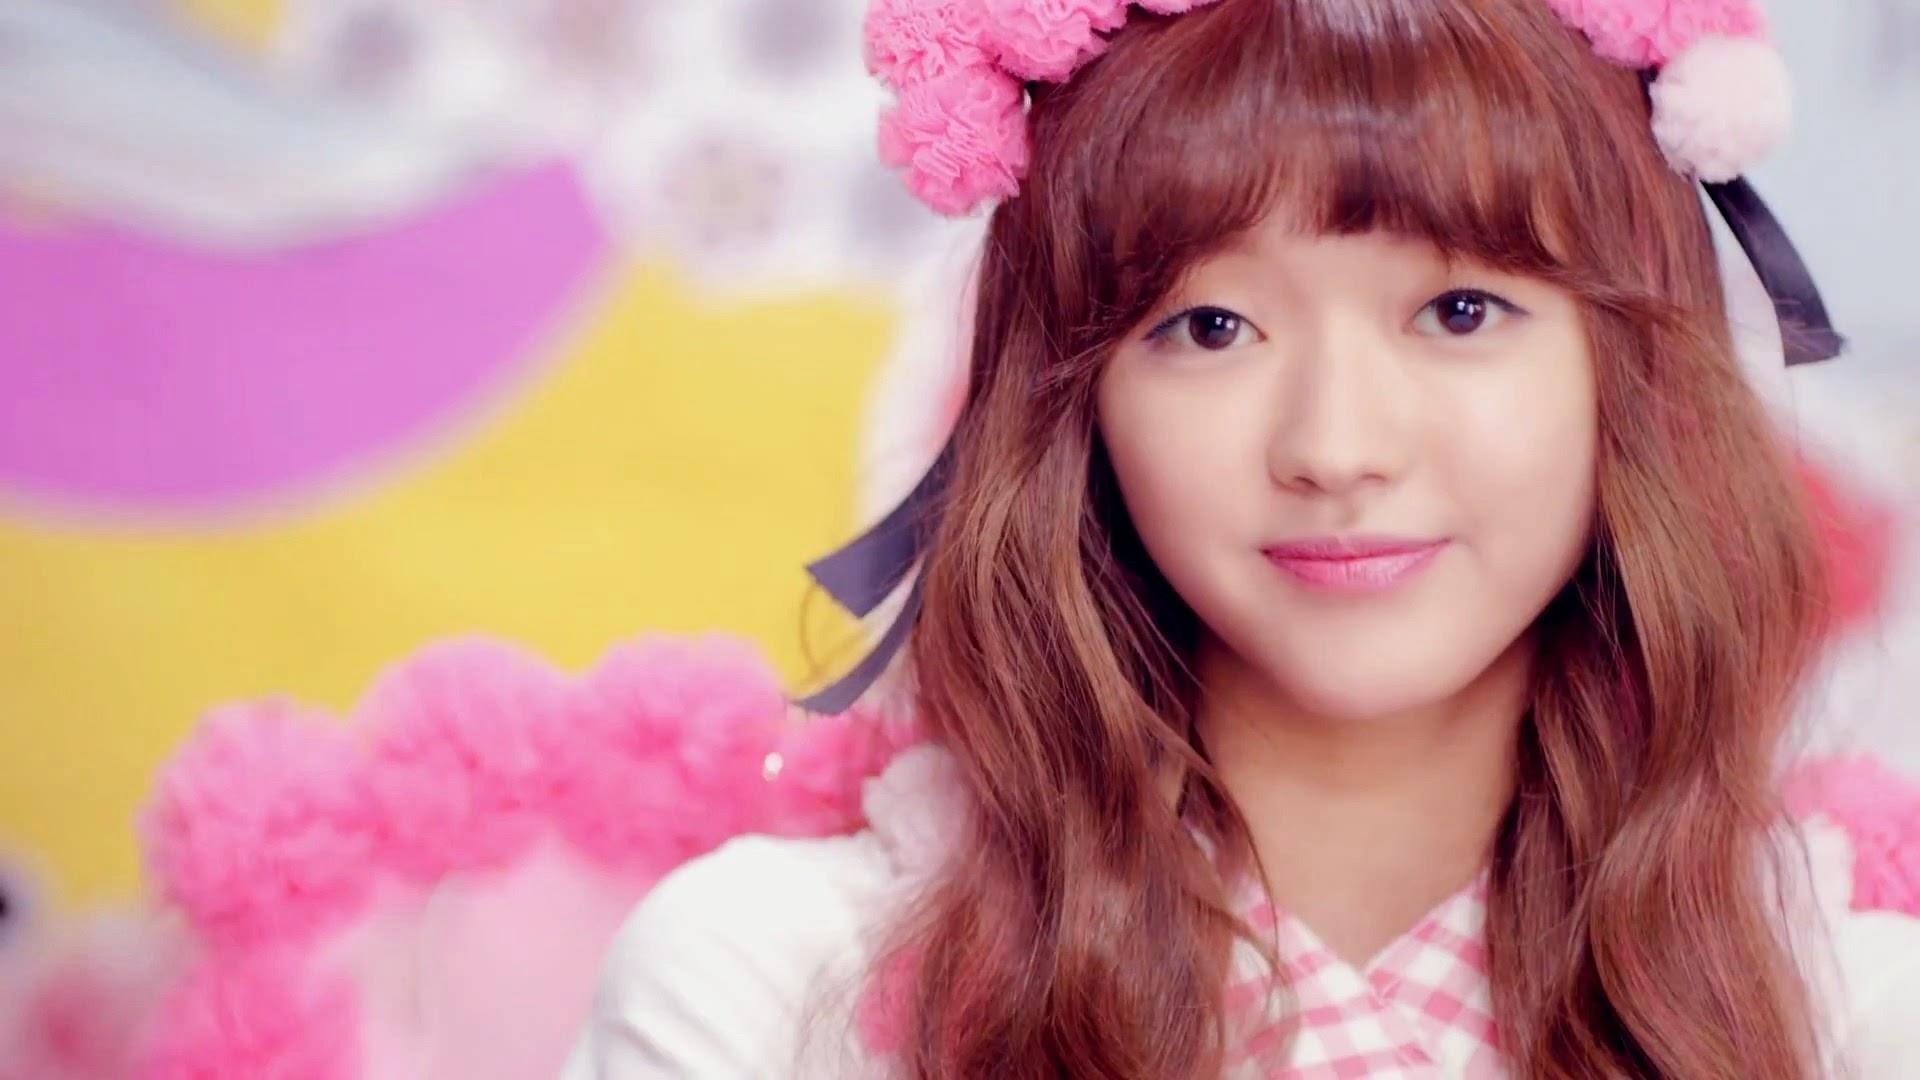 Oh My Girl's Yooa in Cupid MV